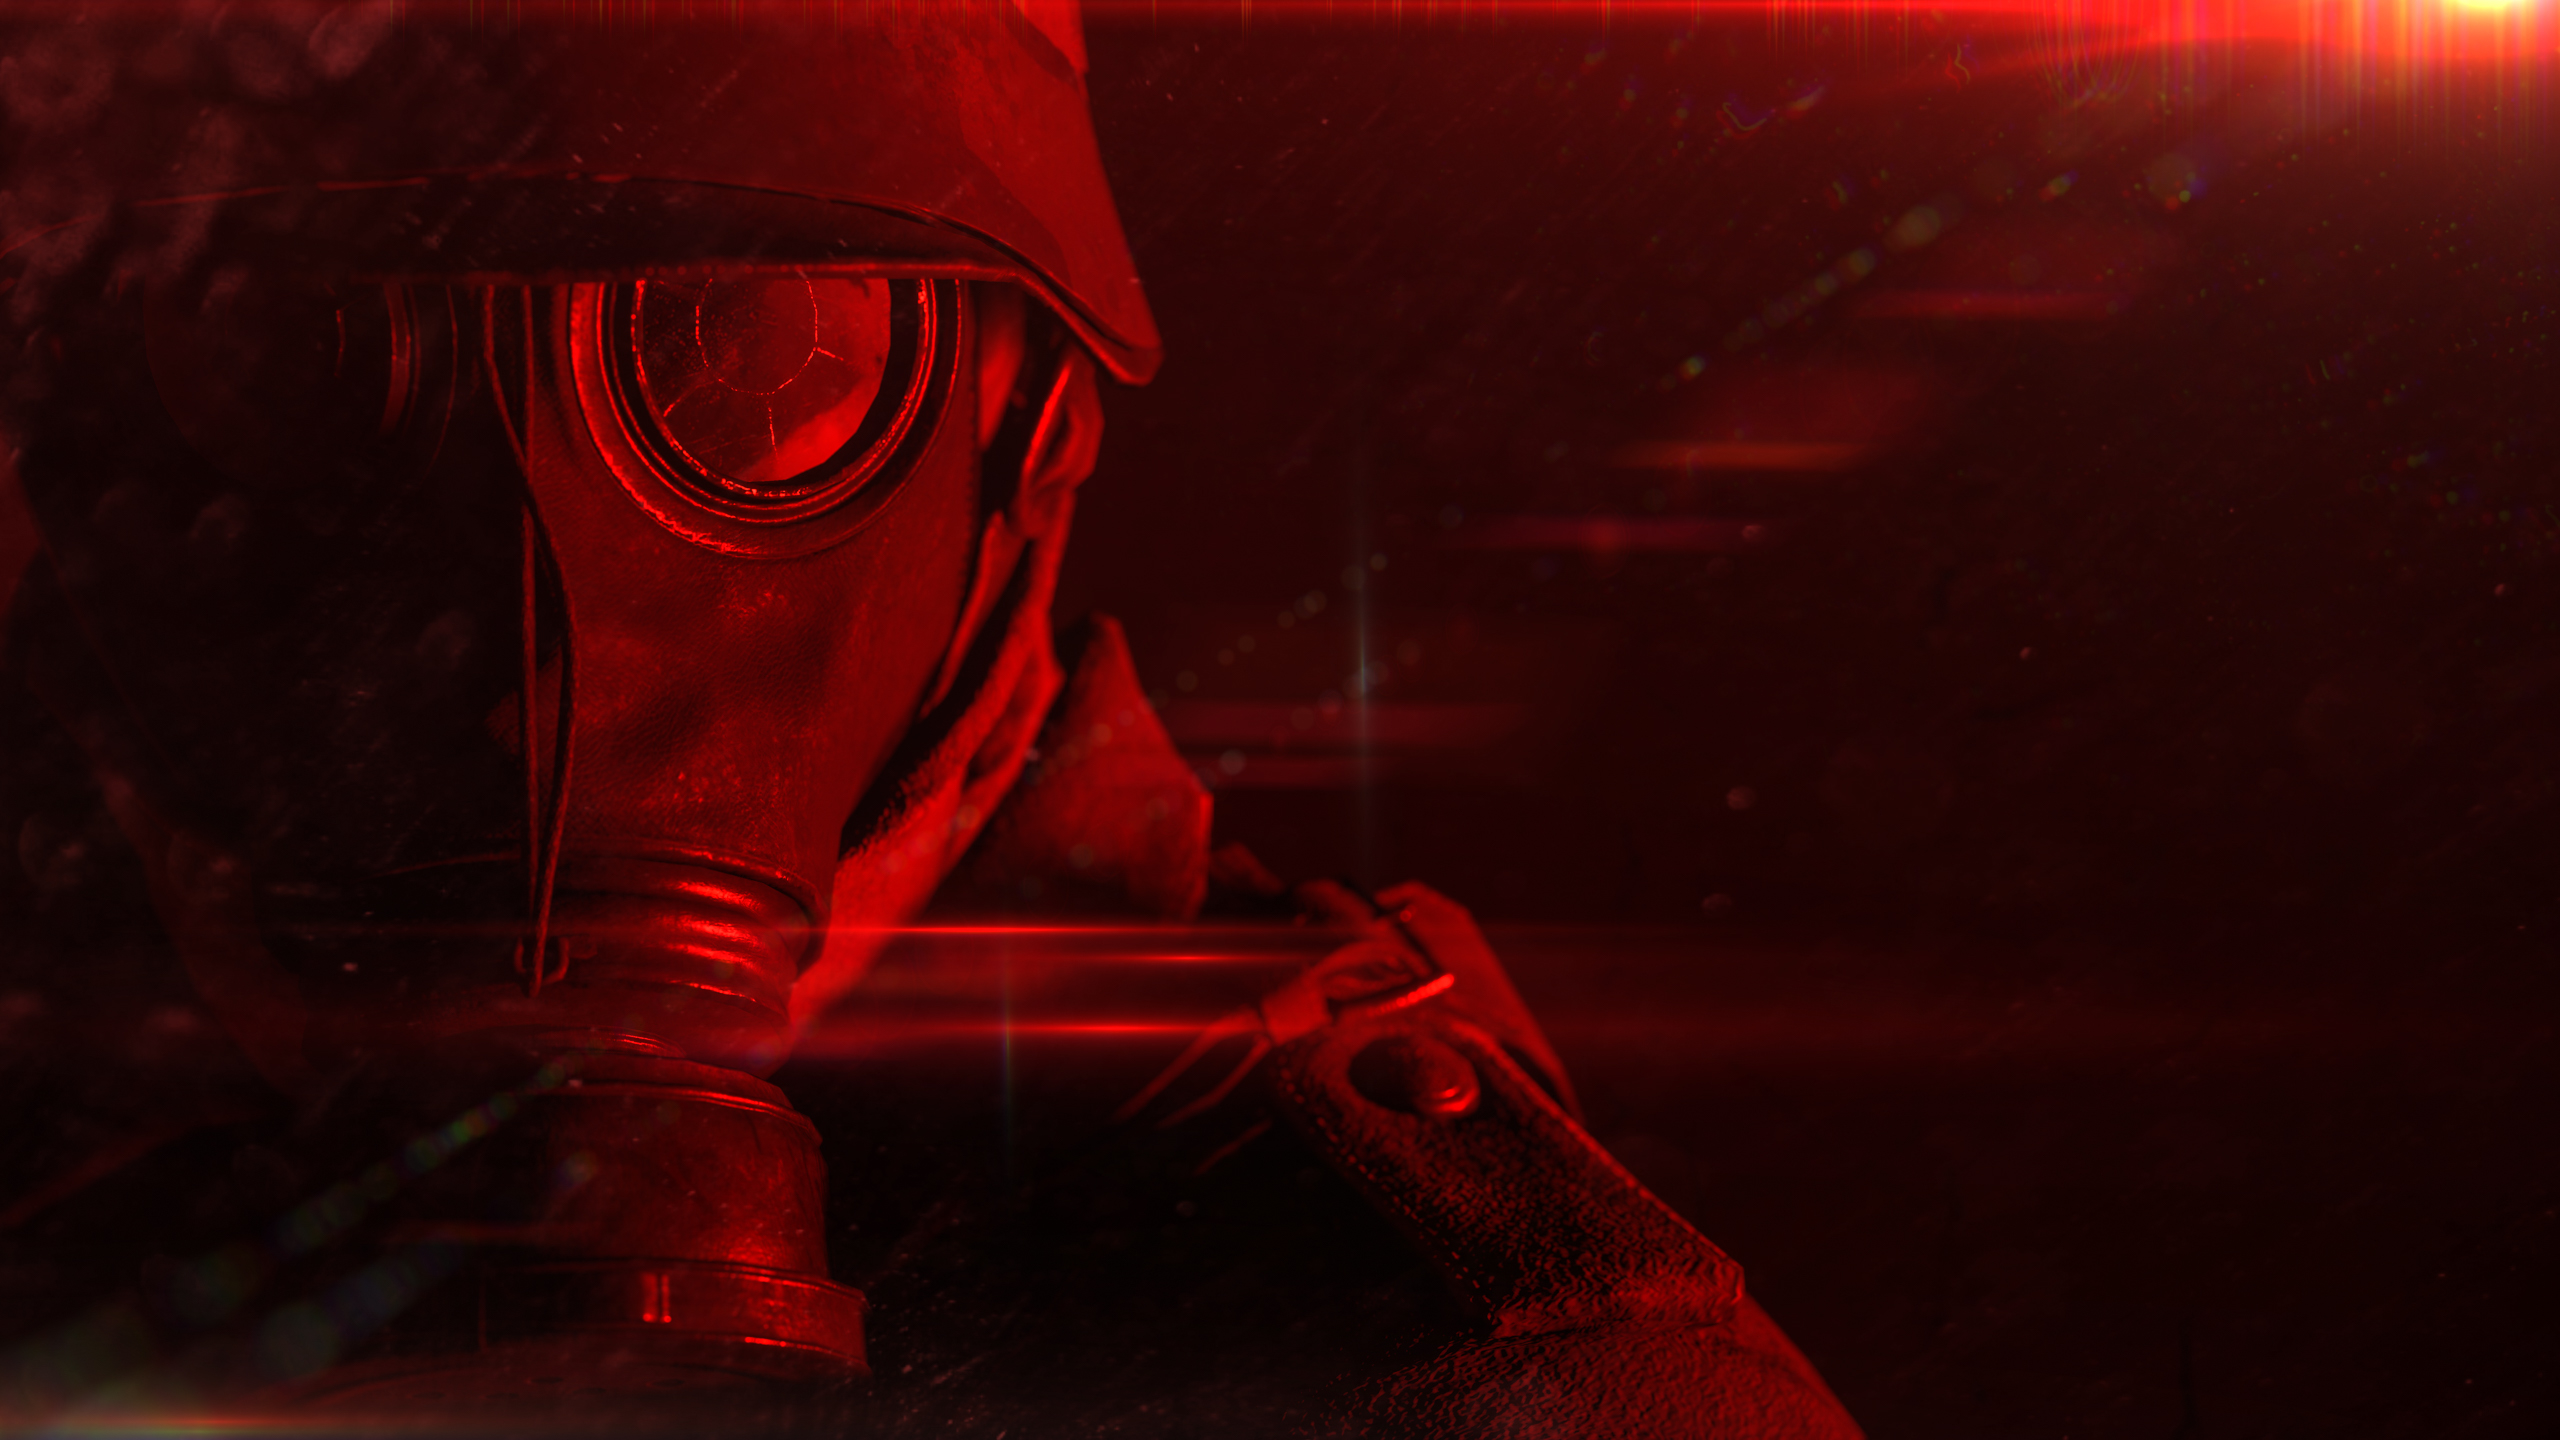 Battlefield Gas Mask Wallpaper Hd Games 4k Wallpapers